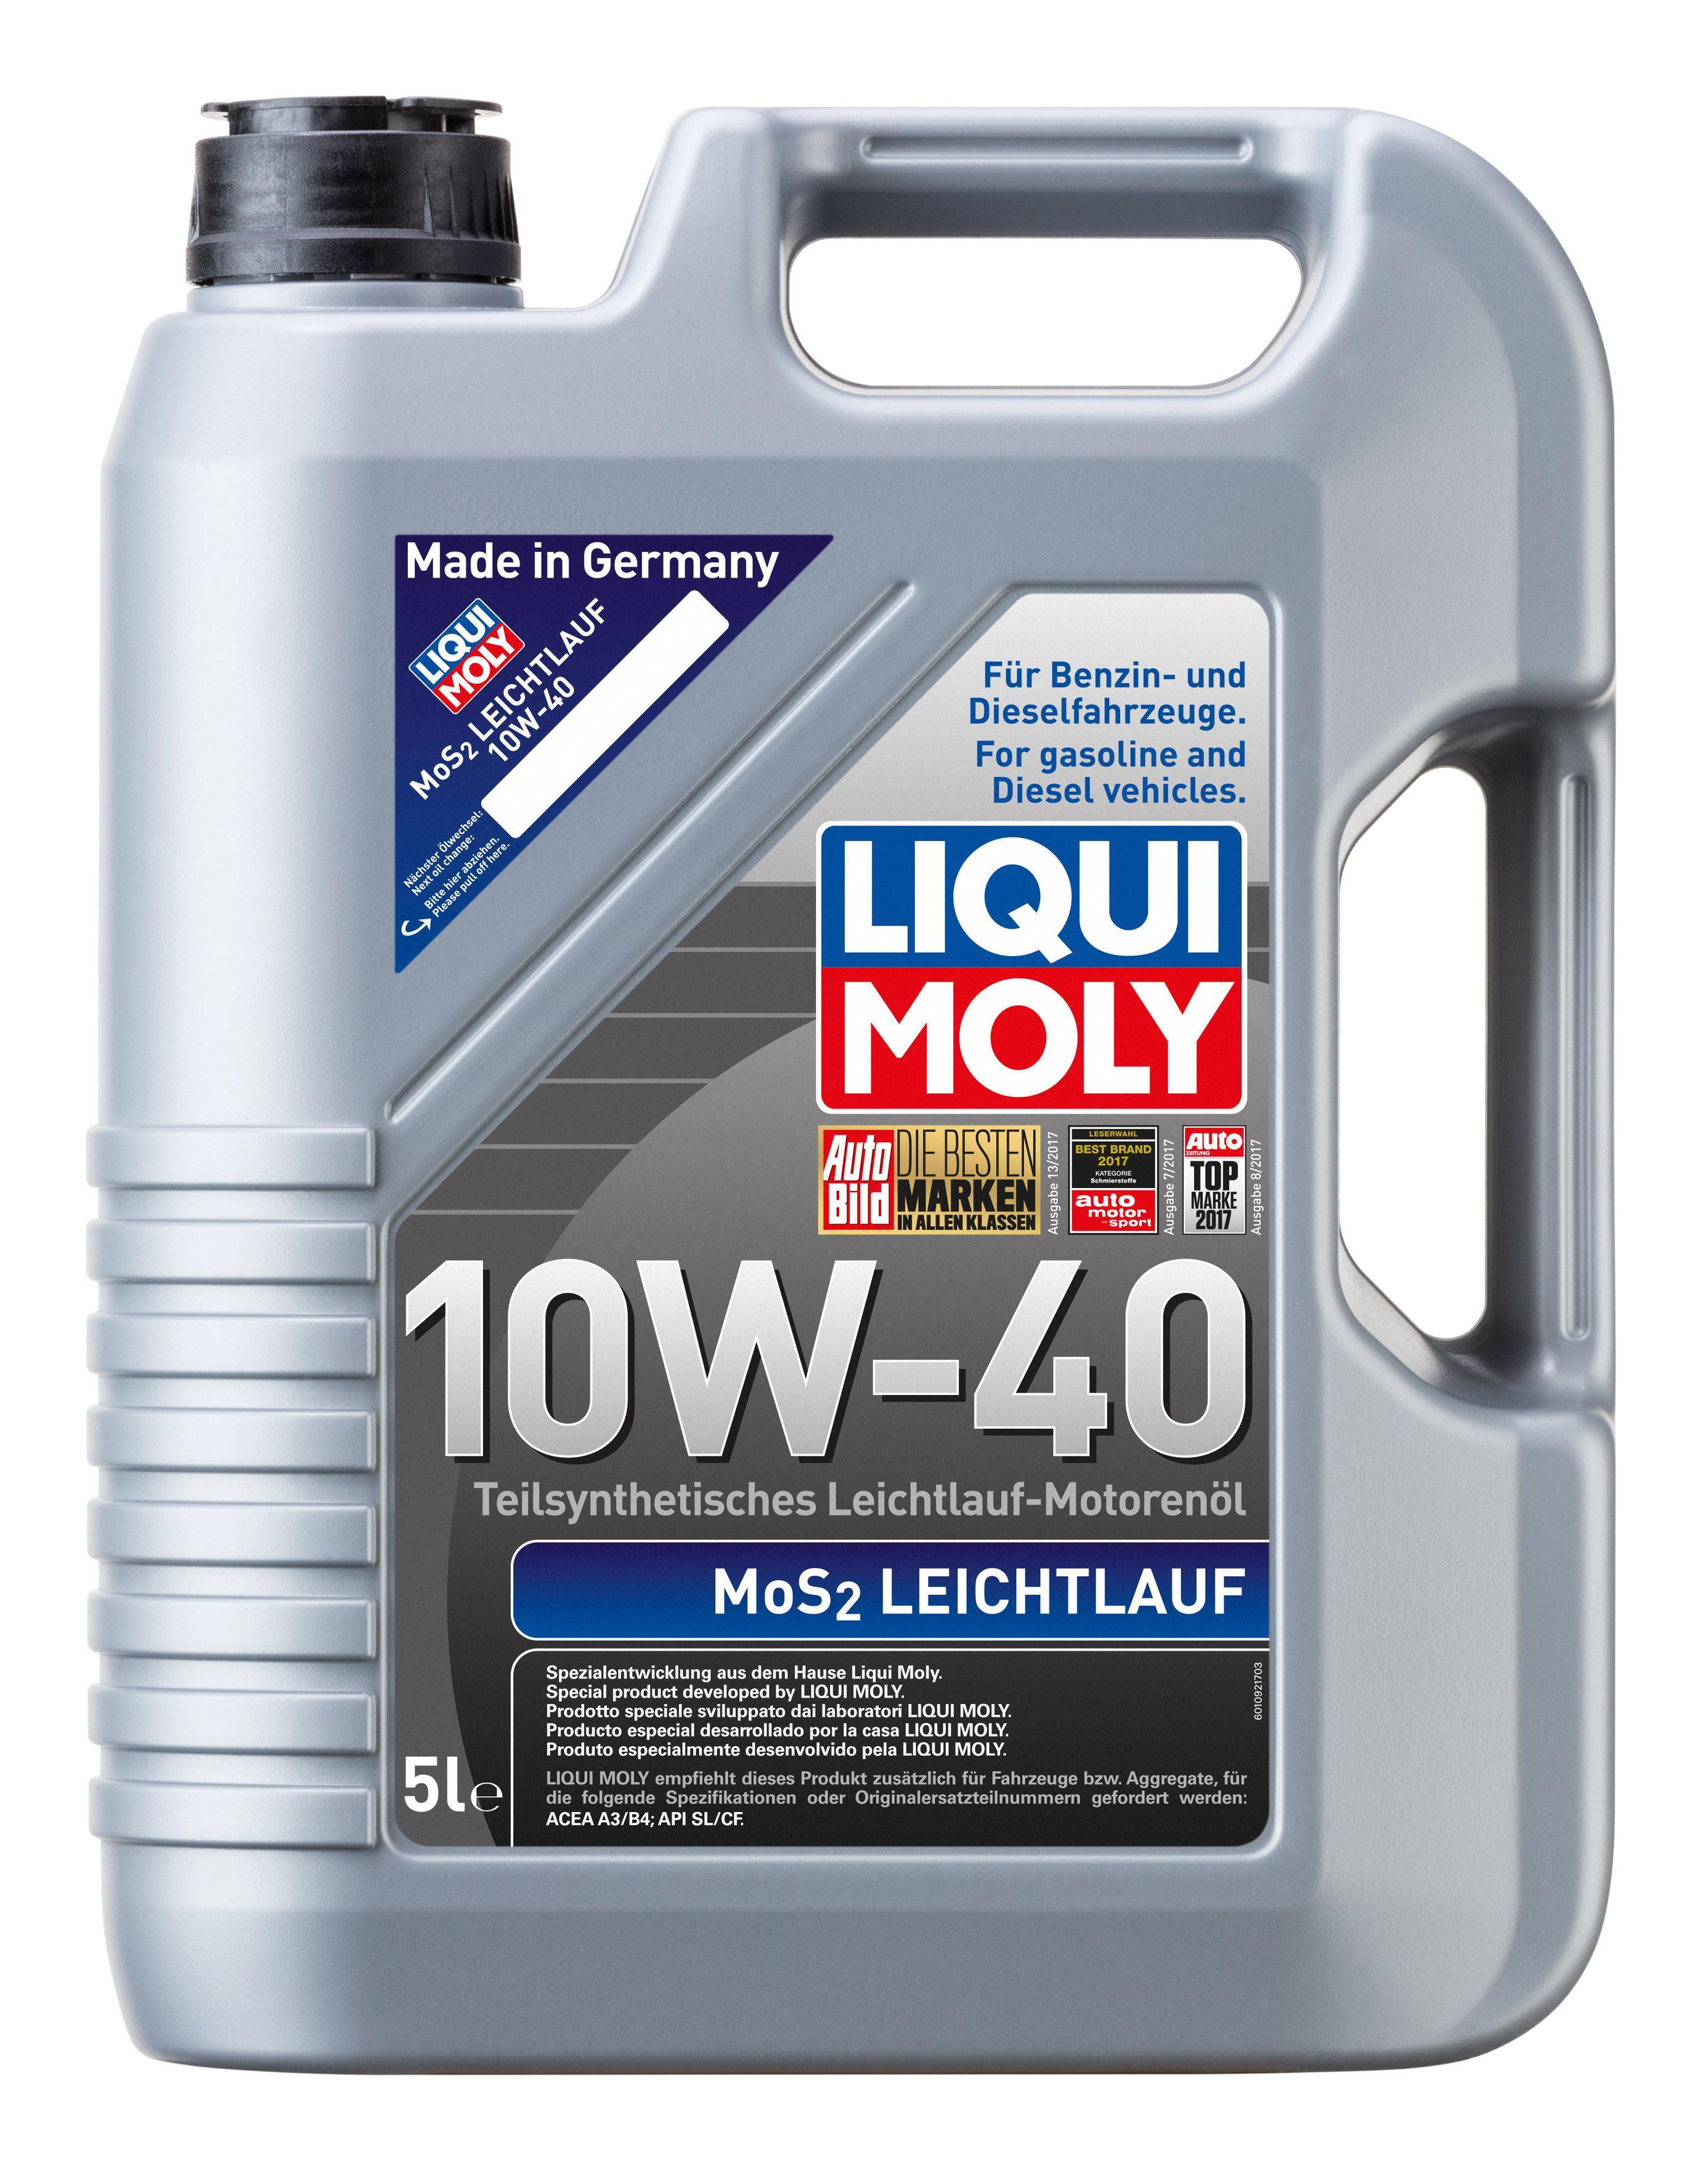 LIQUI MOLY МoS2, Leichtlauf Moottoriöljy 1092 - Osta nyt!